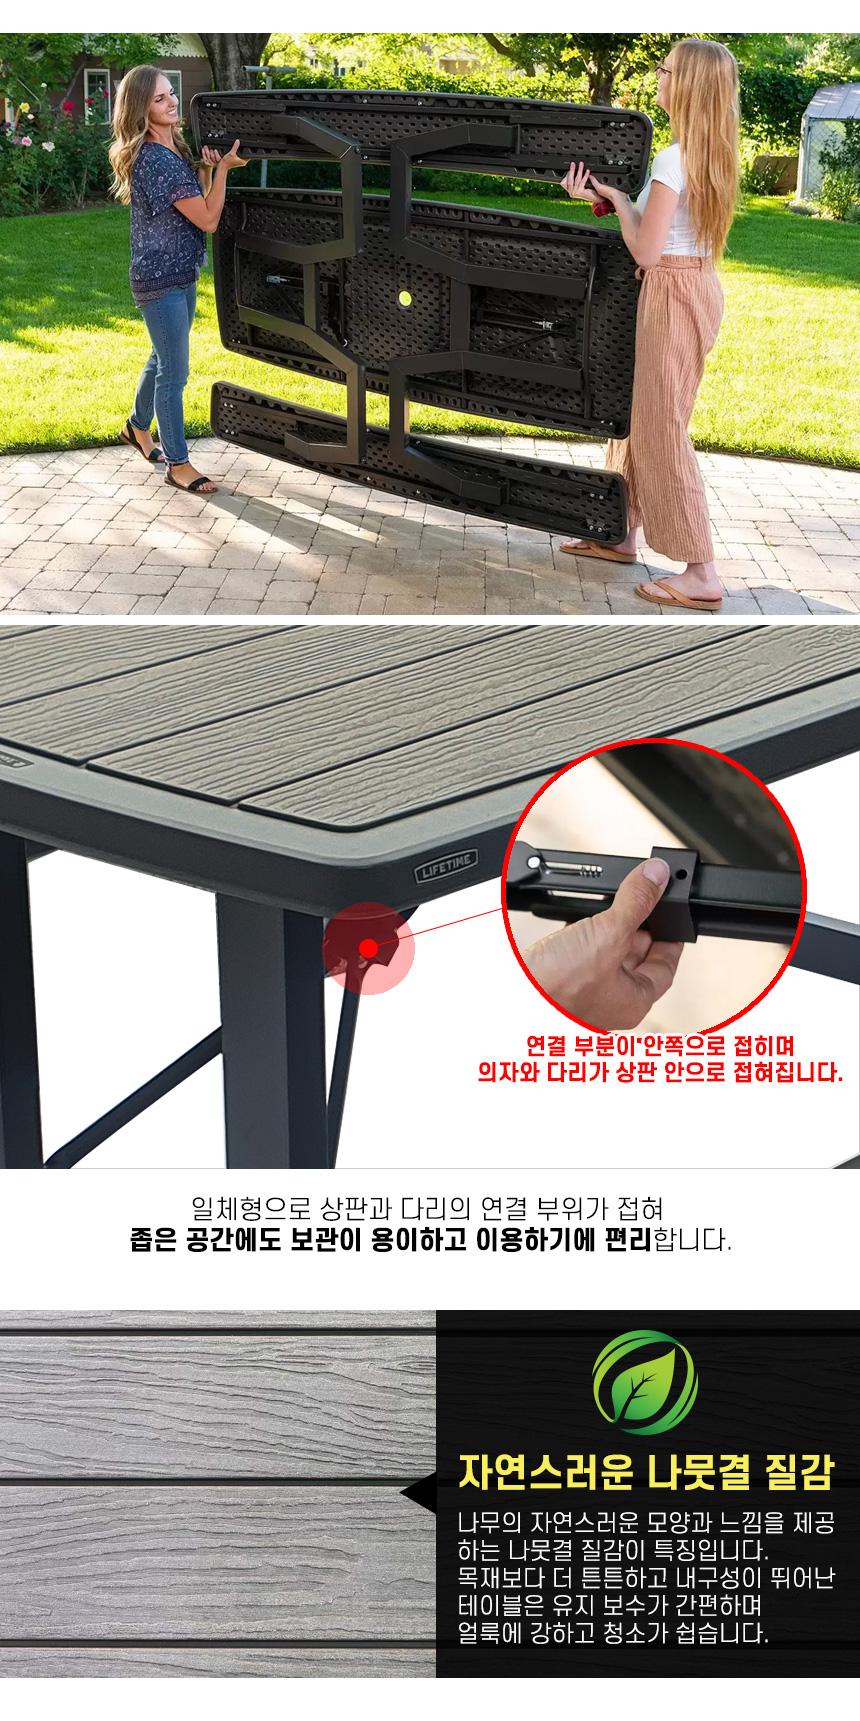 folding_picnic_04.jpg